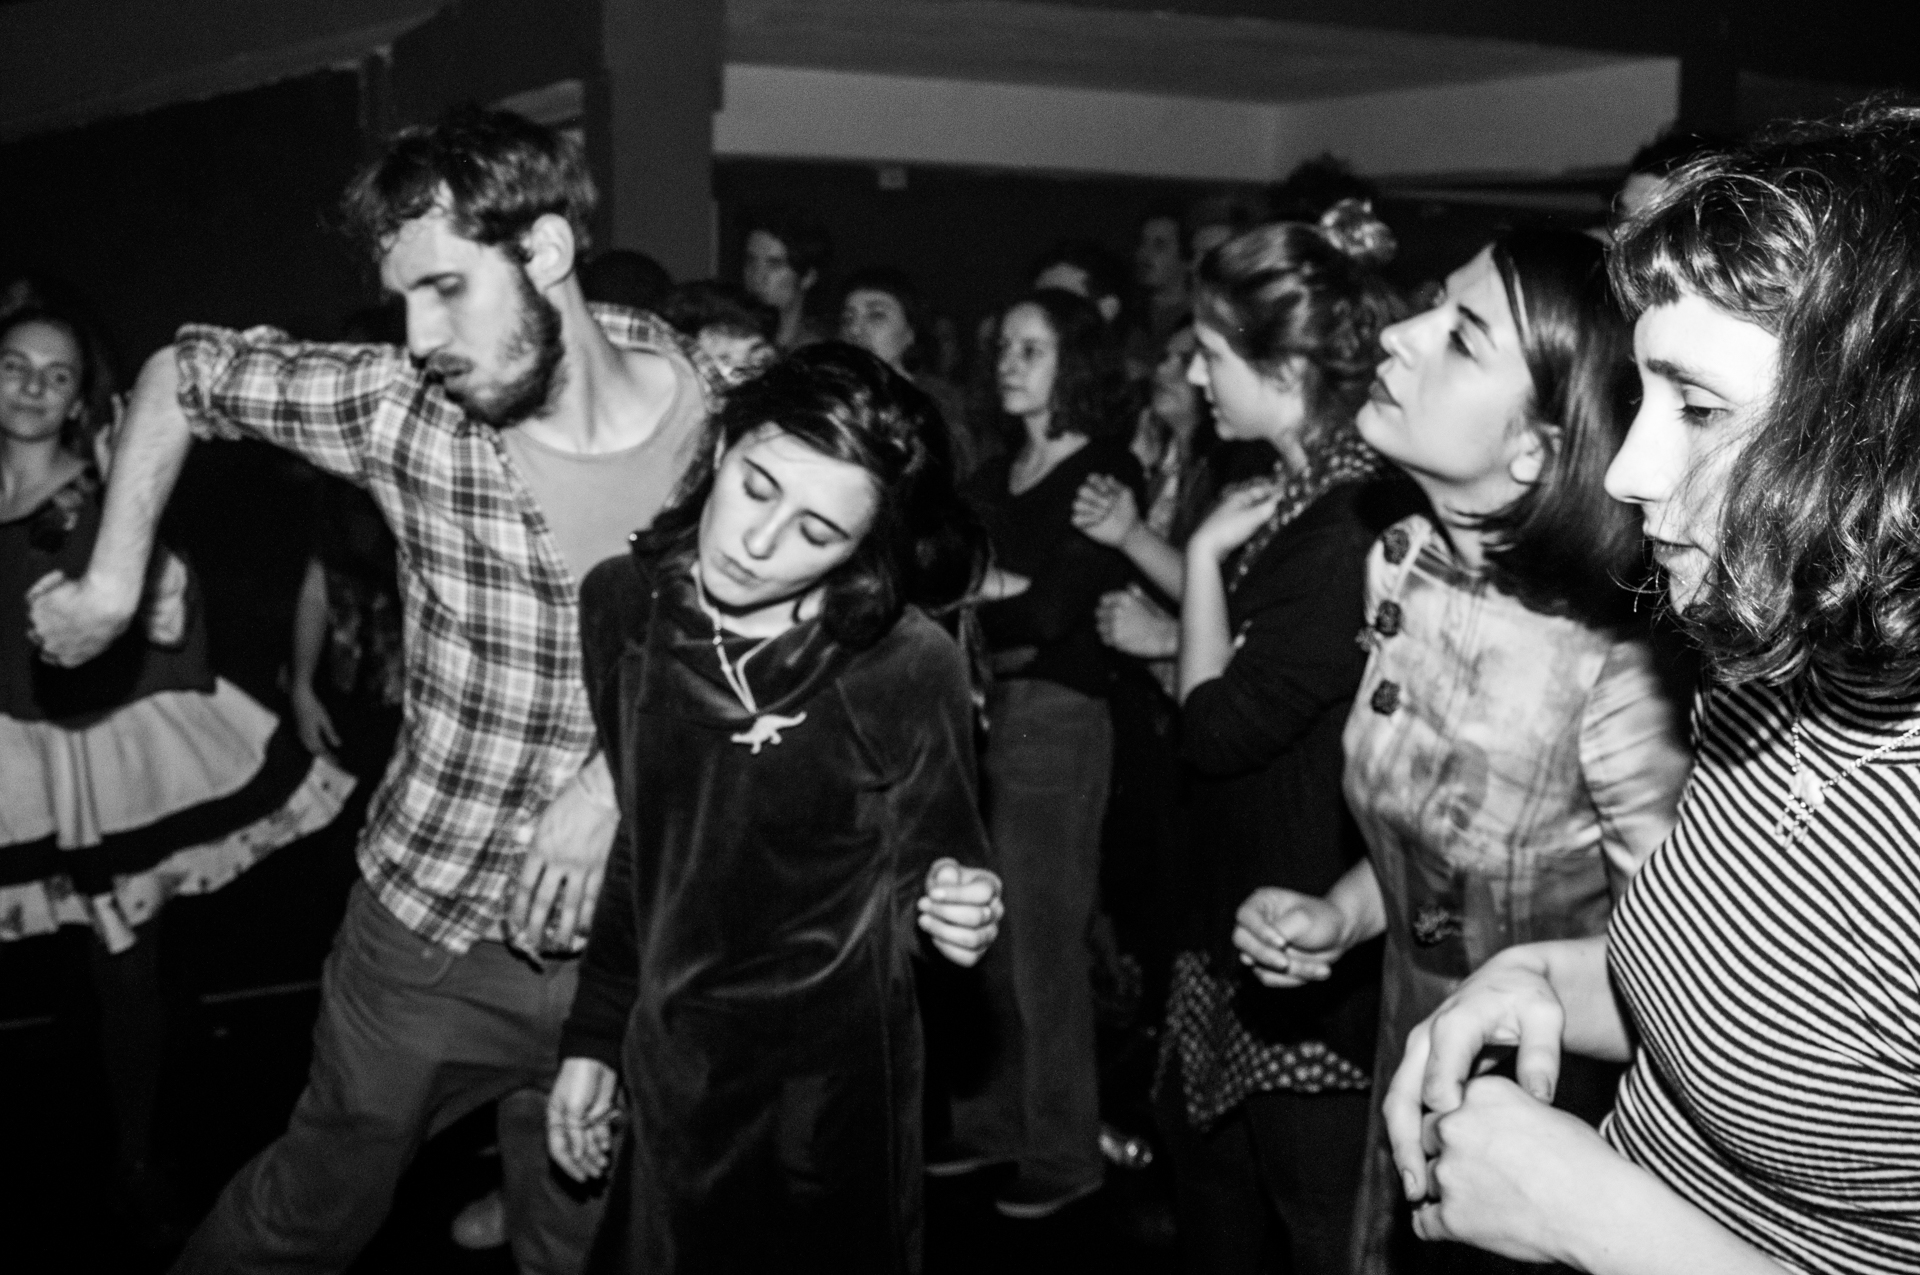 Ciclo-Indie-Hoy-Beatflow-14-Julio-2016-Indie-Hoy-Daniela-Cilli-01-0788